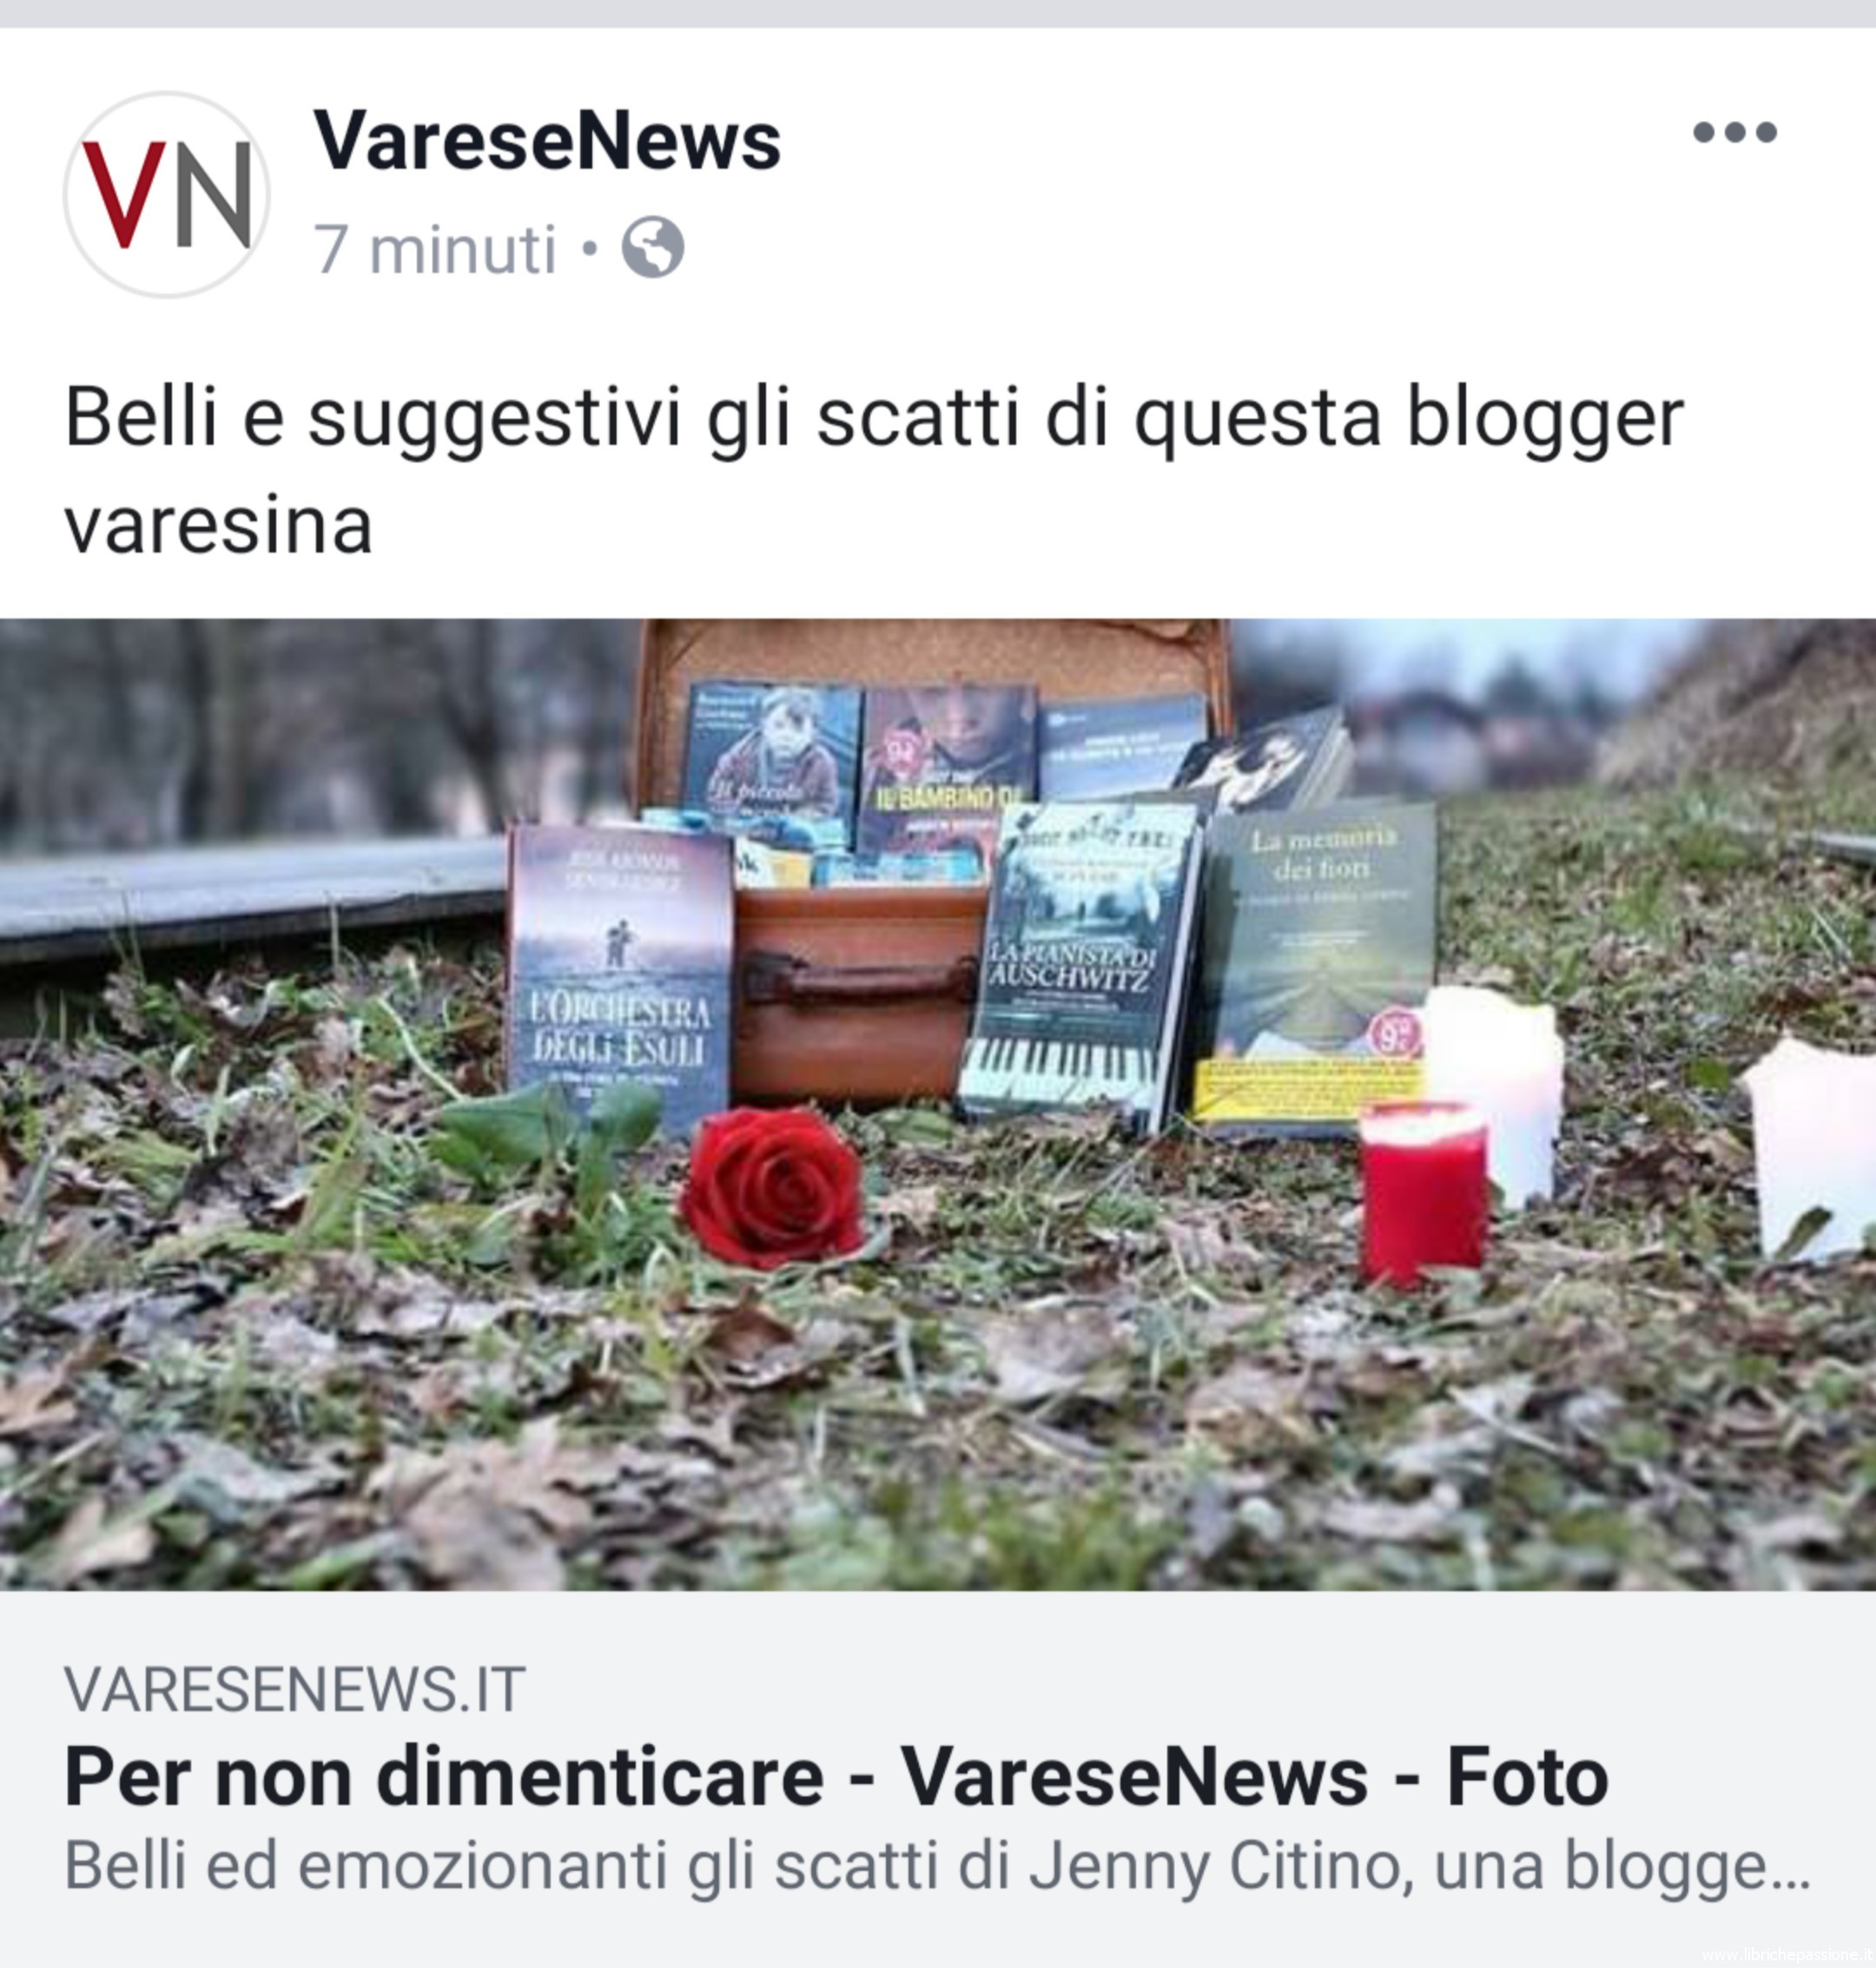 galleria su VareseNews